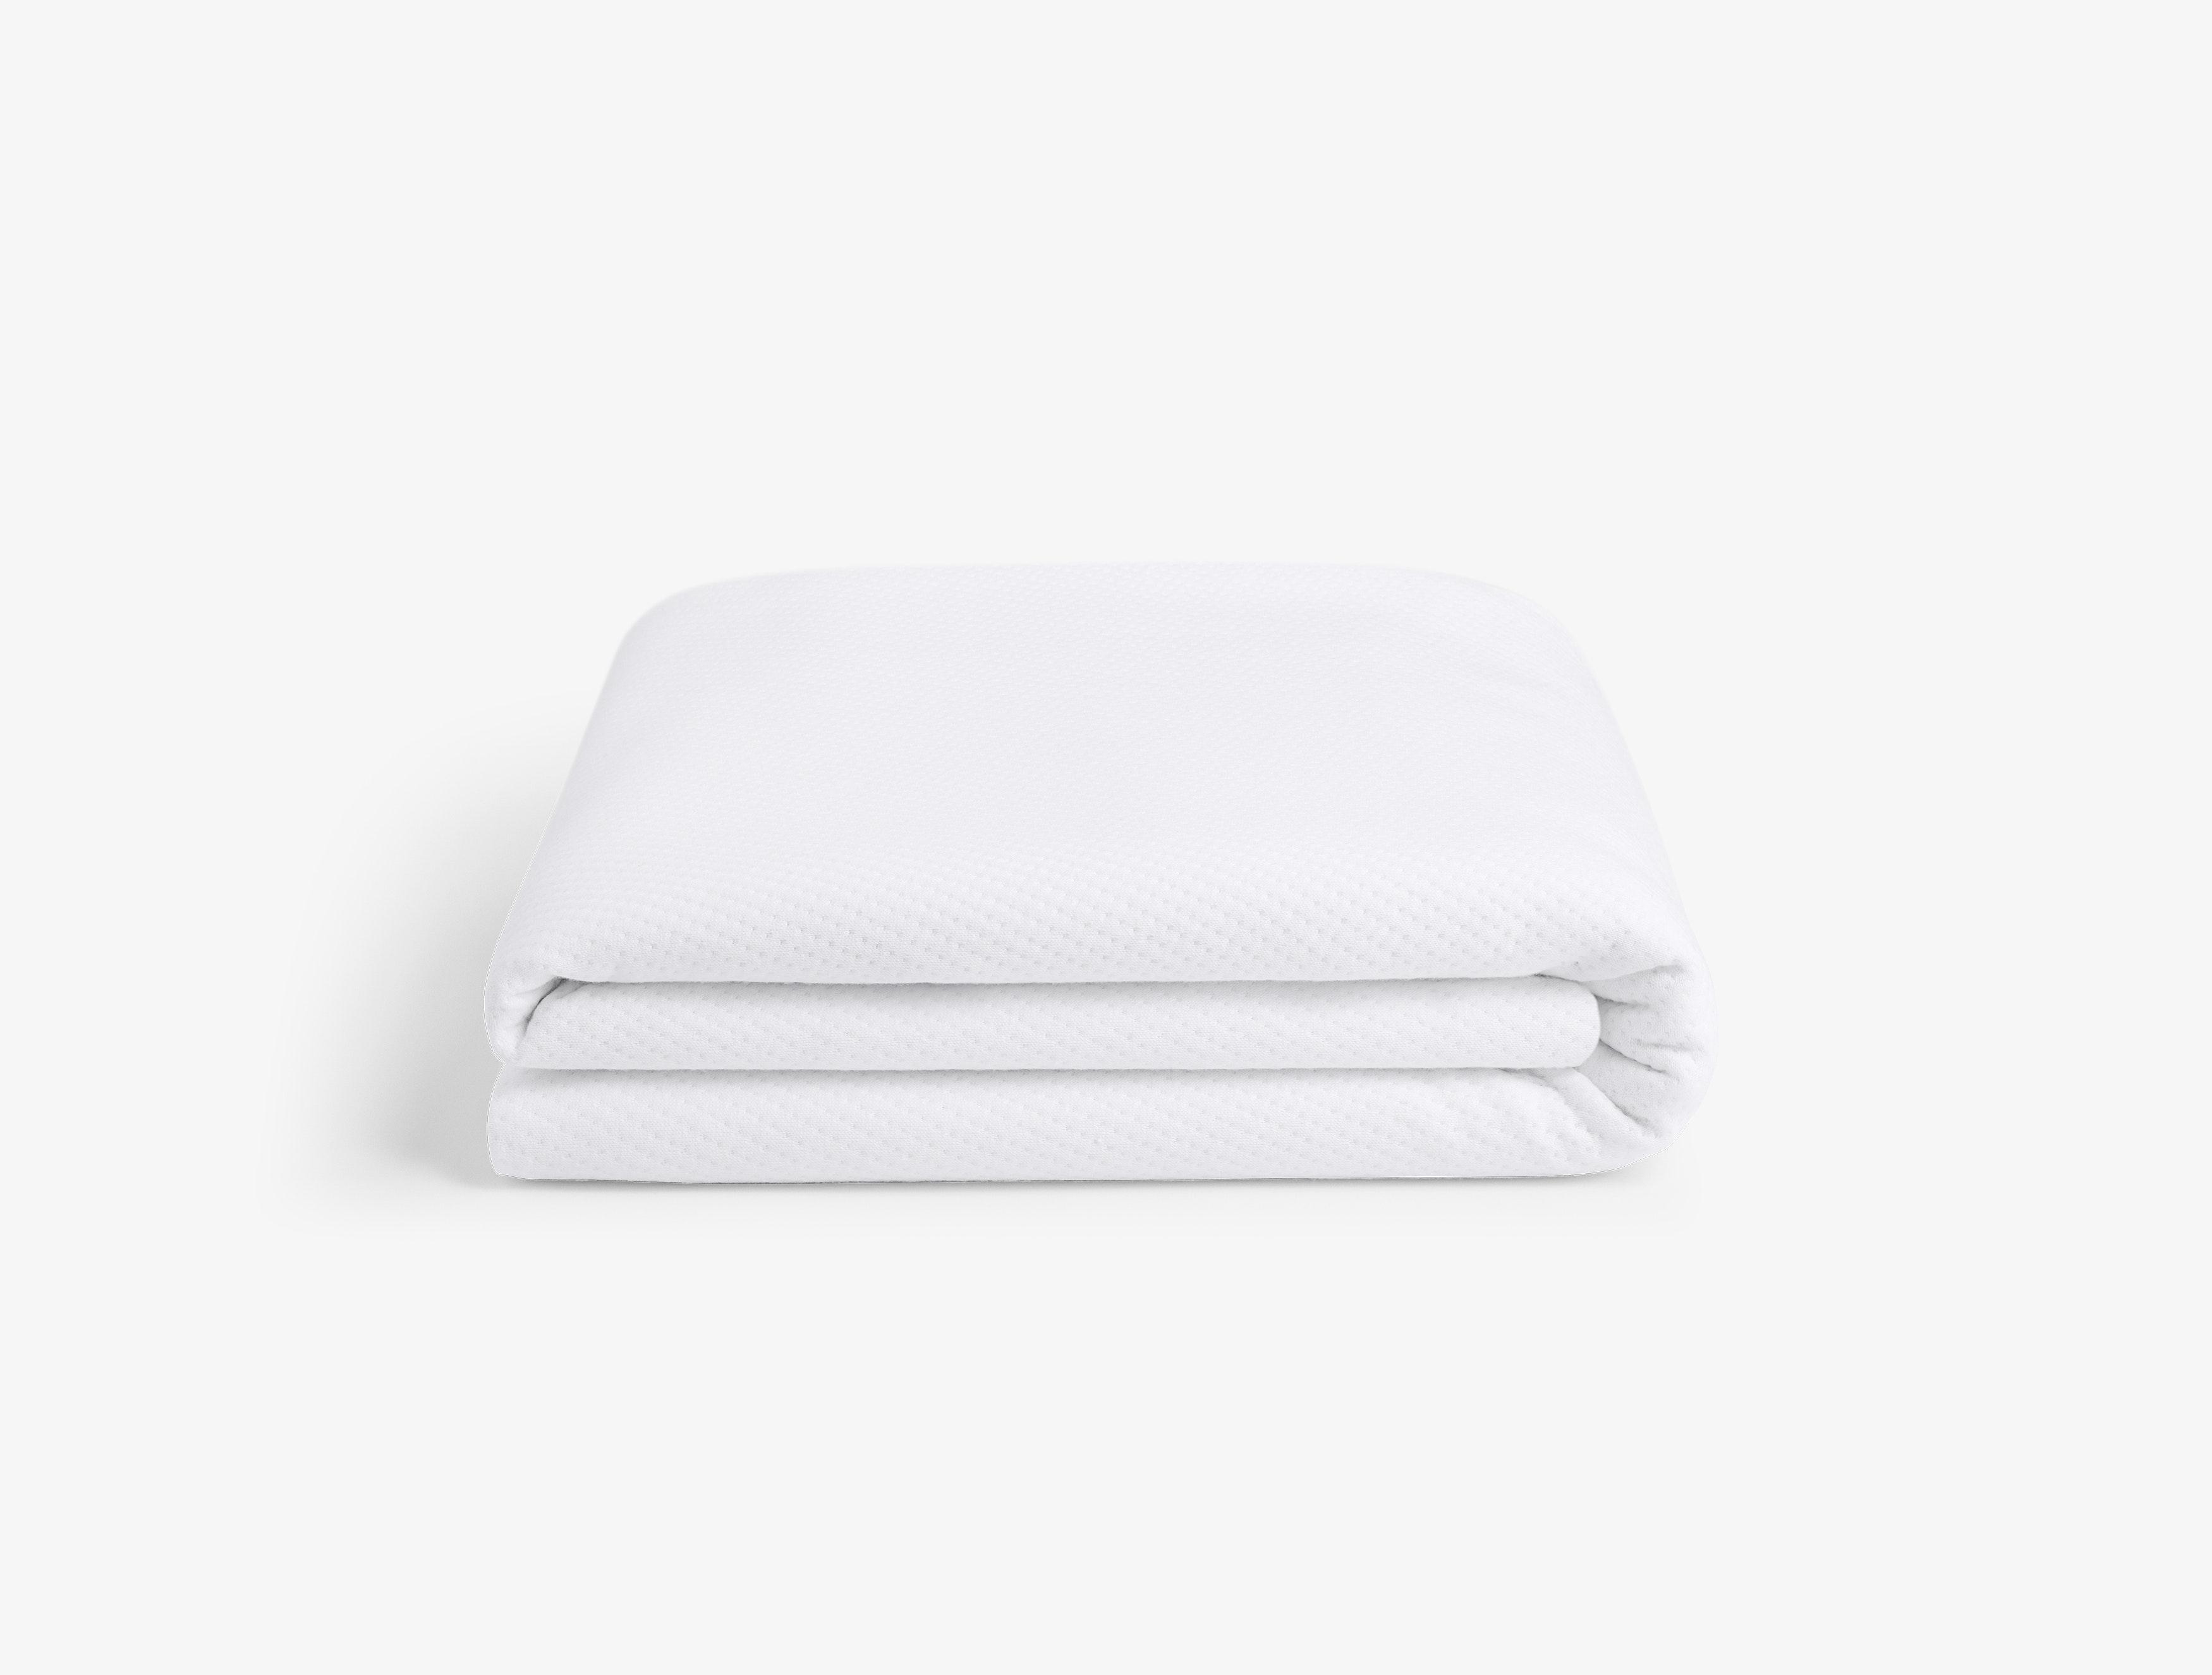 casper mattress protector folded